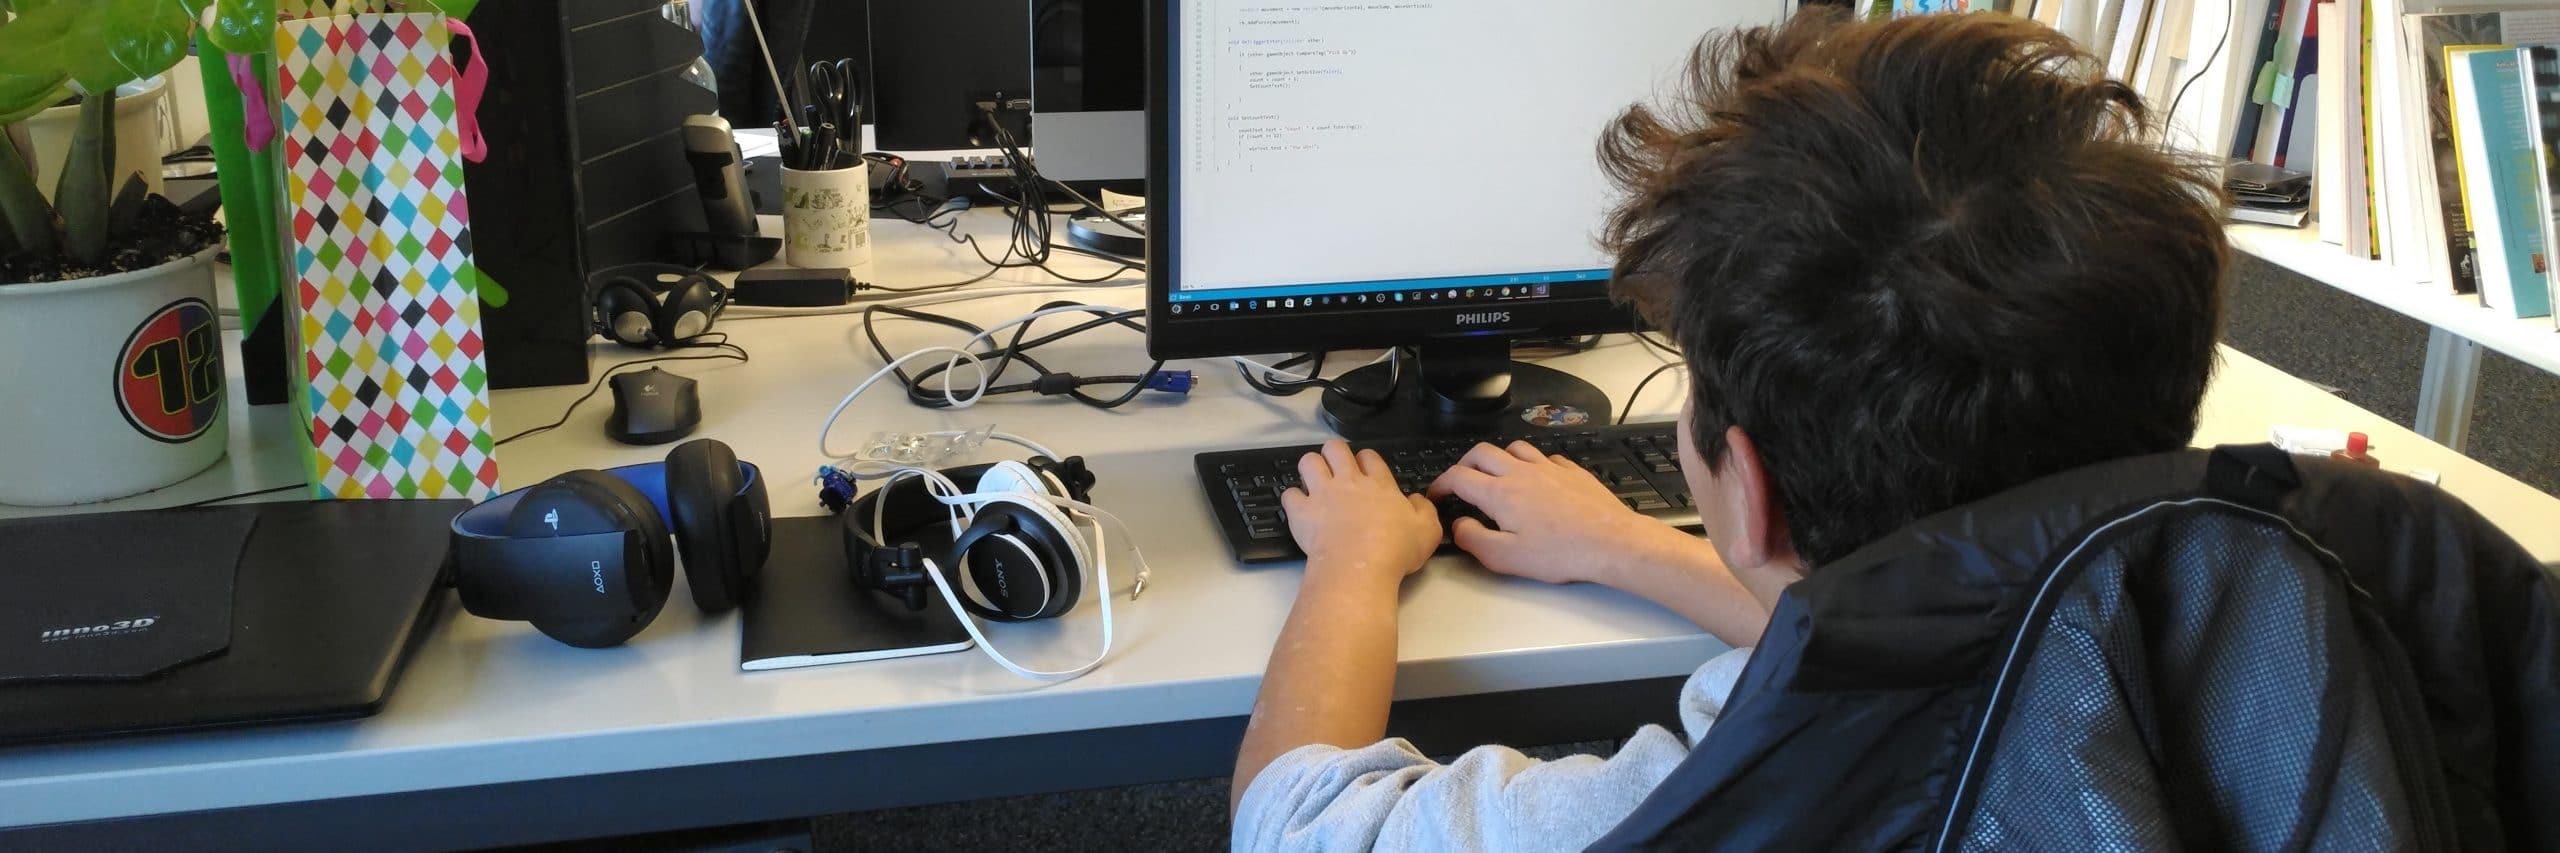 Loris' Blog – Schnupperwoche als Game Developer bei Gbanga